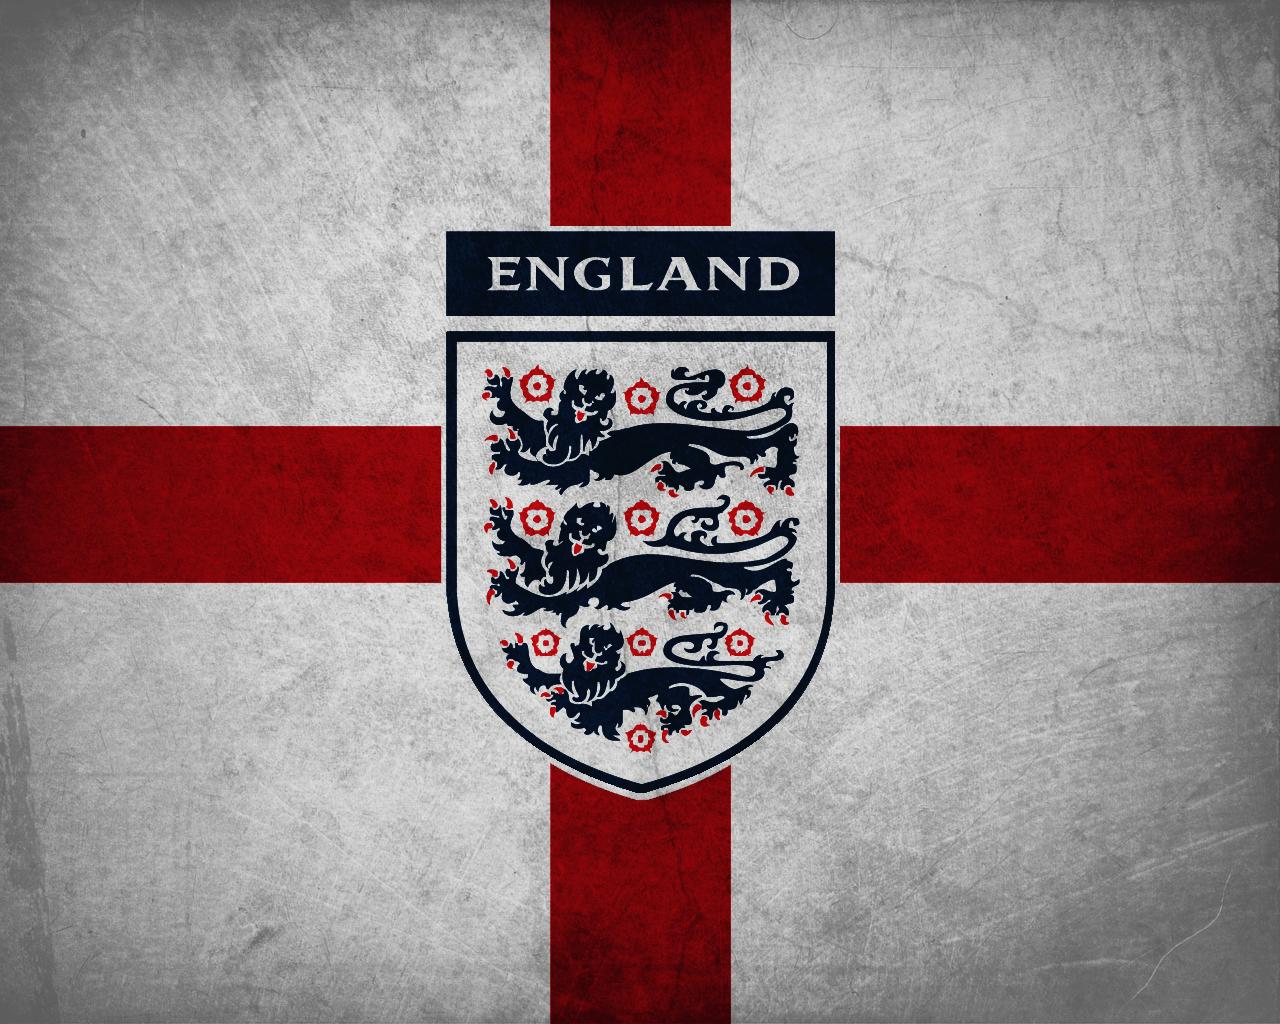 english flag wallpaper - photo #22